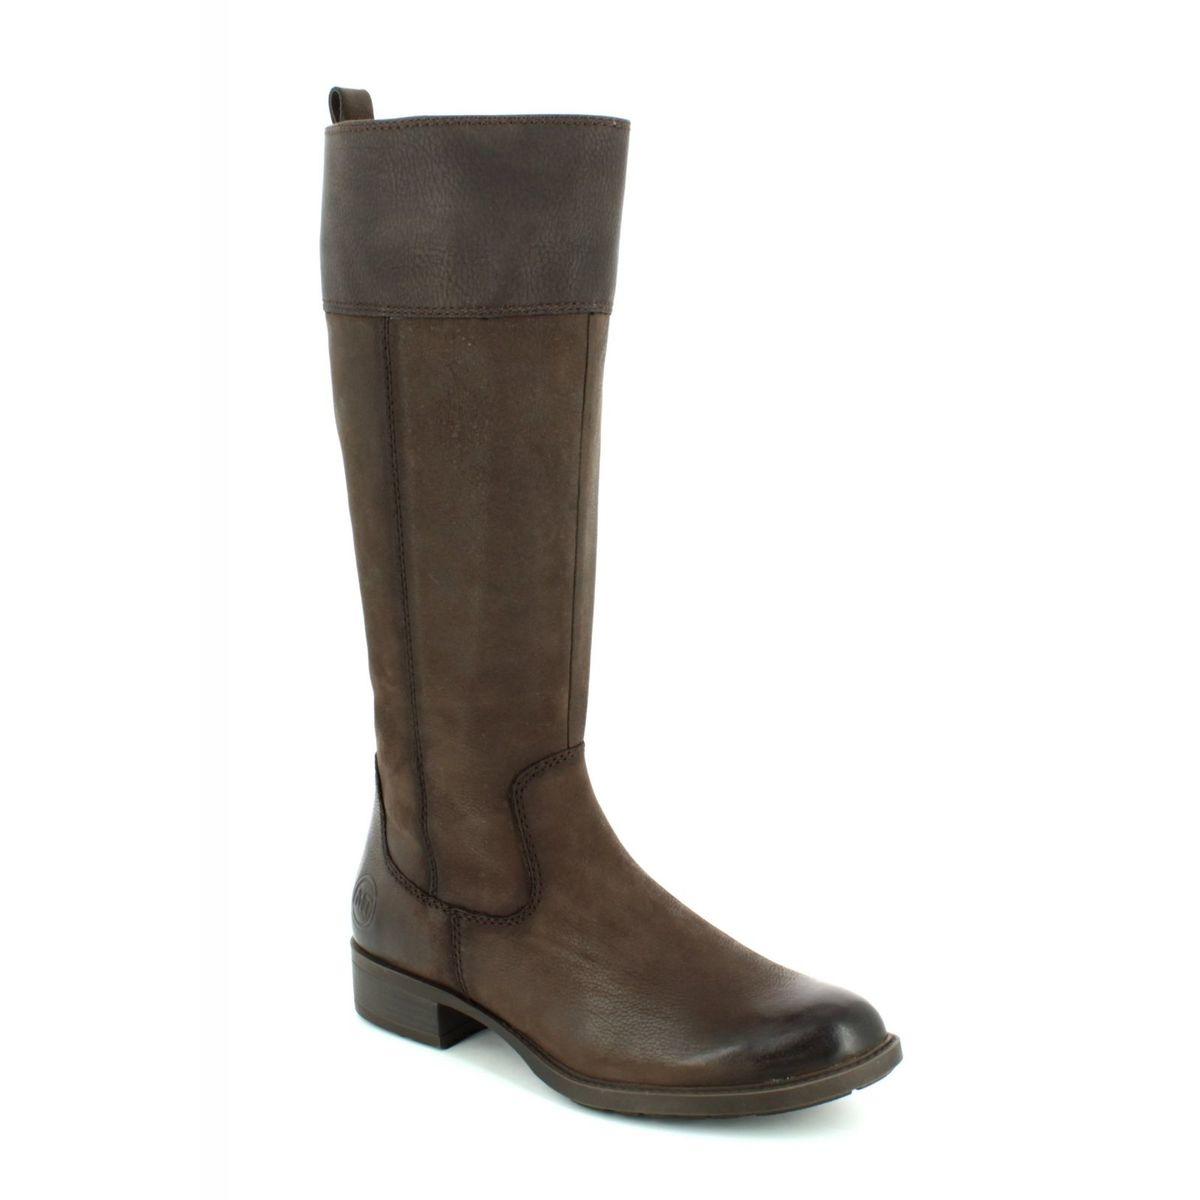 16eeaef3b5e Marco Tozzi Knee-high Boots - Brown - 25616 325 FILAGO